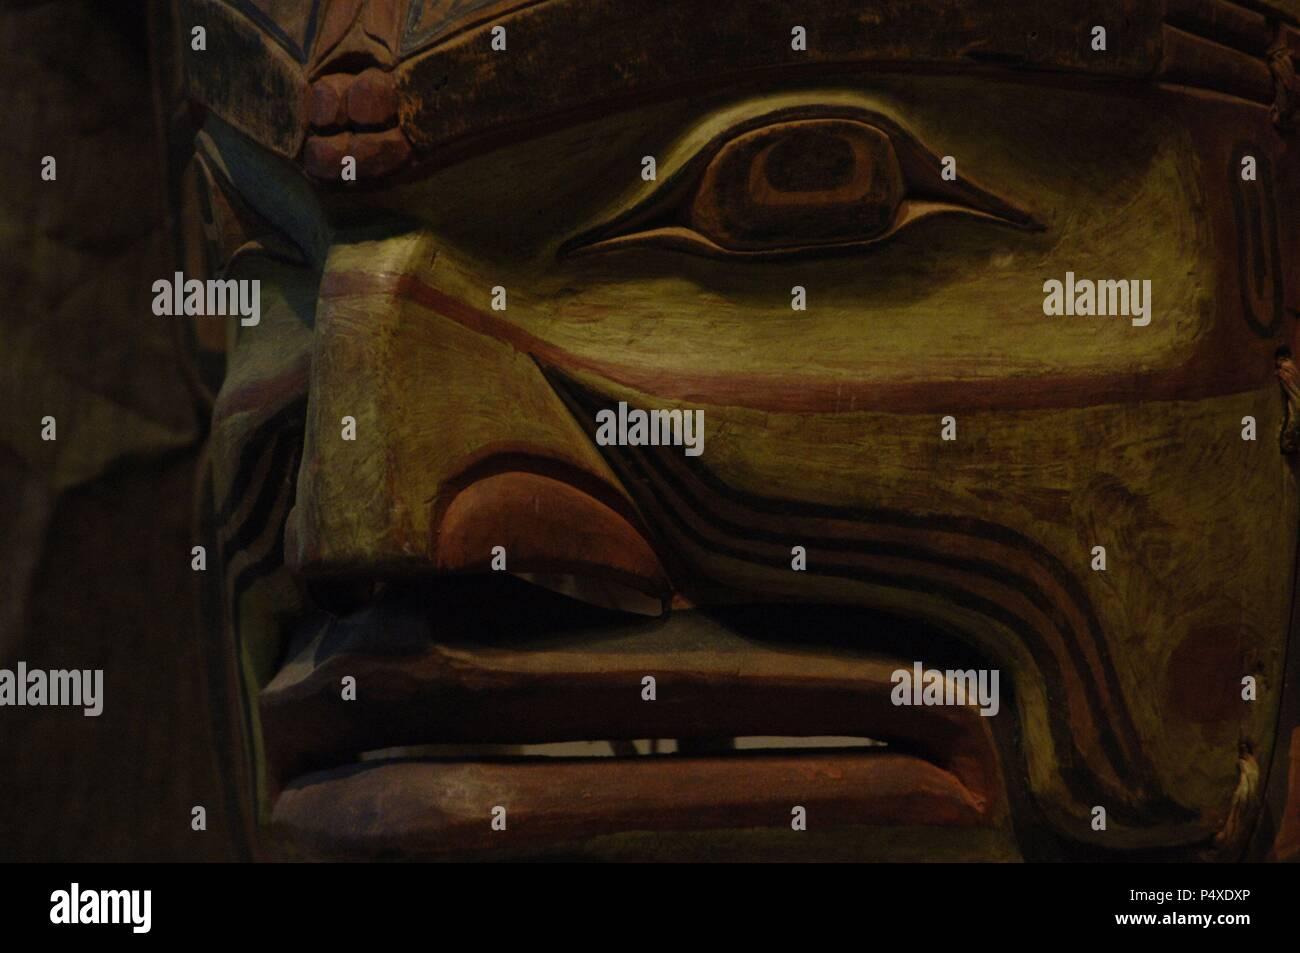 ARTE etnico. CULTURA KWAKWAKA'WAKW. SIGLO XX MUNGO MARTIN (1881-1962). Detalle de MASCARA (hacia 1900) en madera. Canadá. Museo de Arte de Denver. El estado de Colorado. Estados Unidos. Imagen De Stock